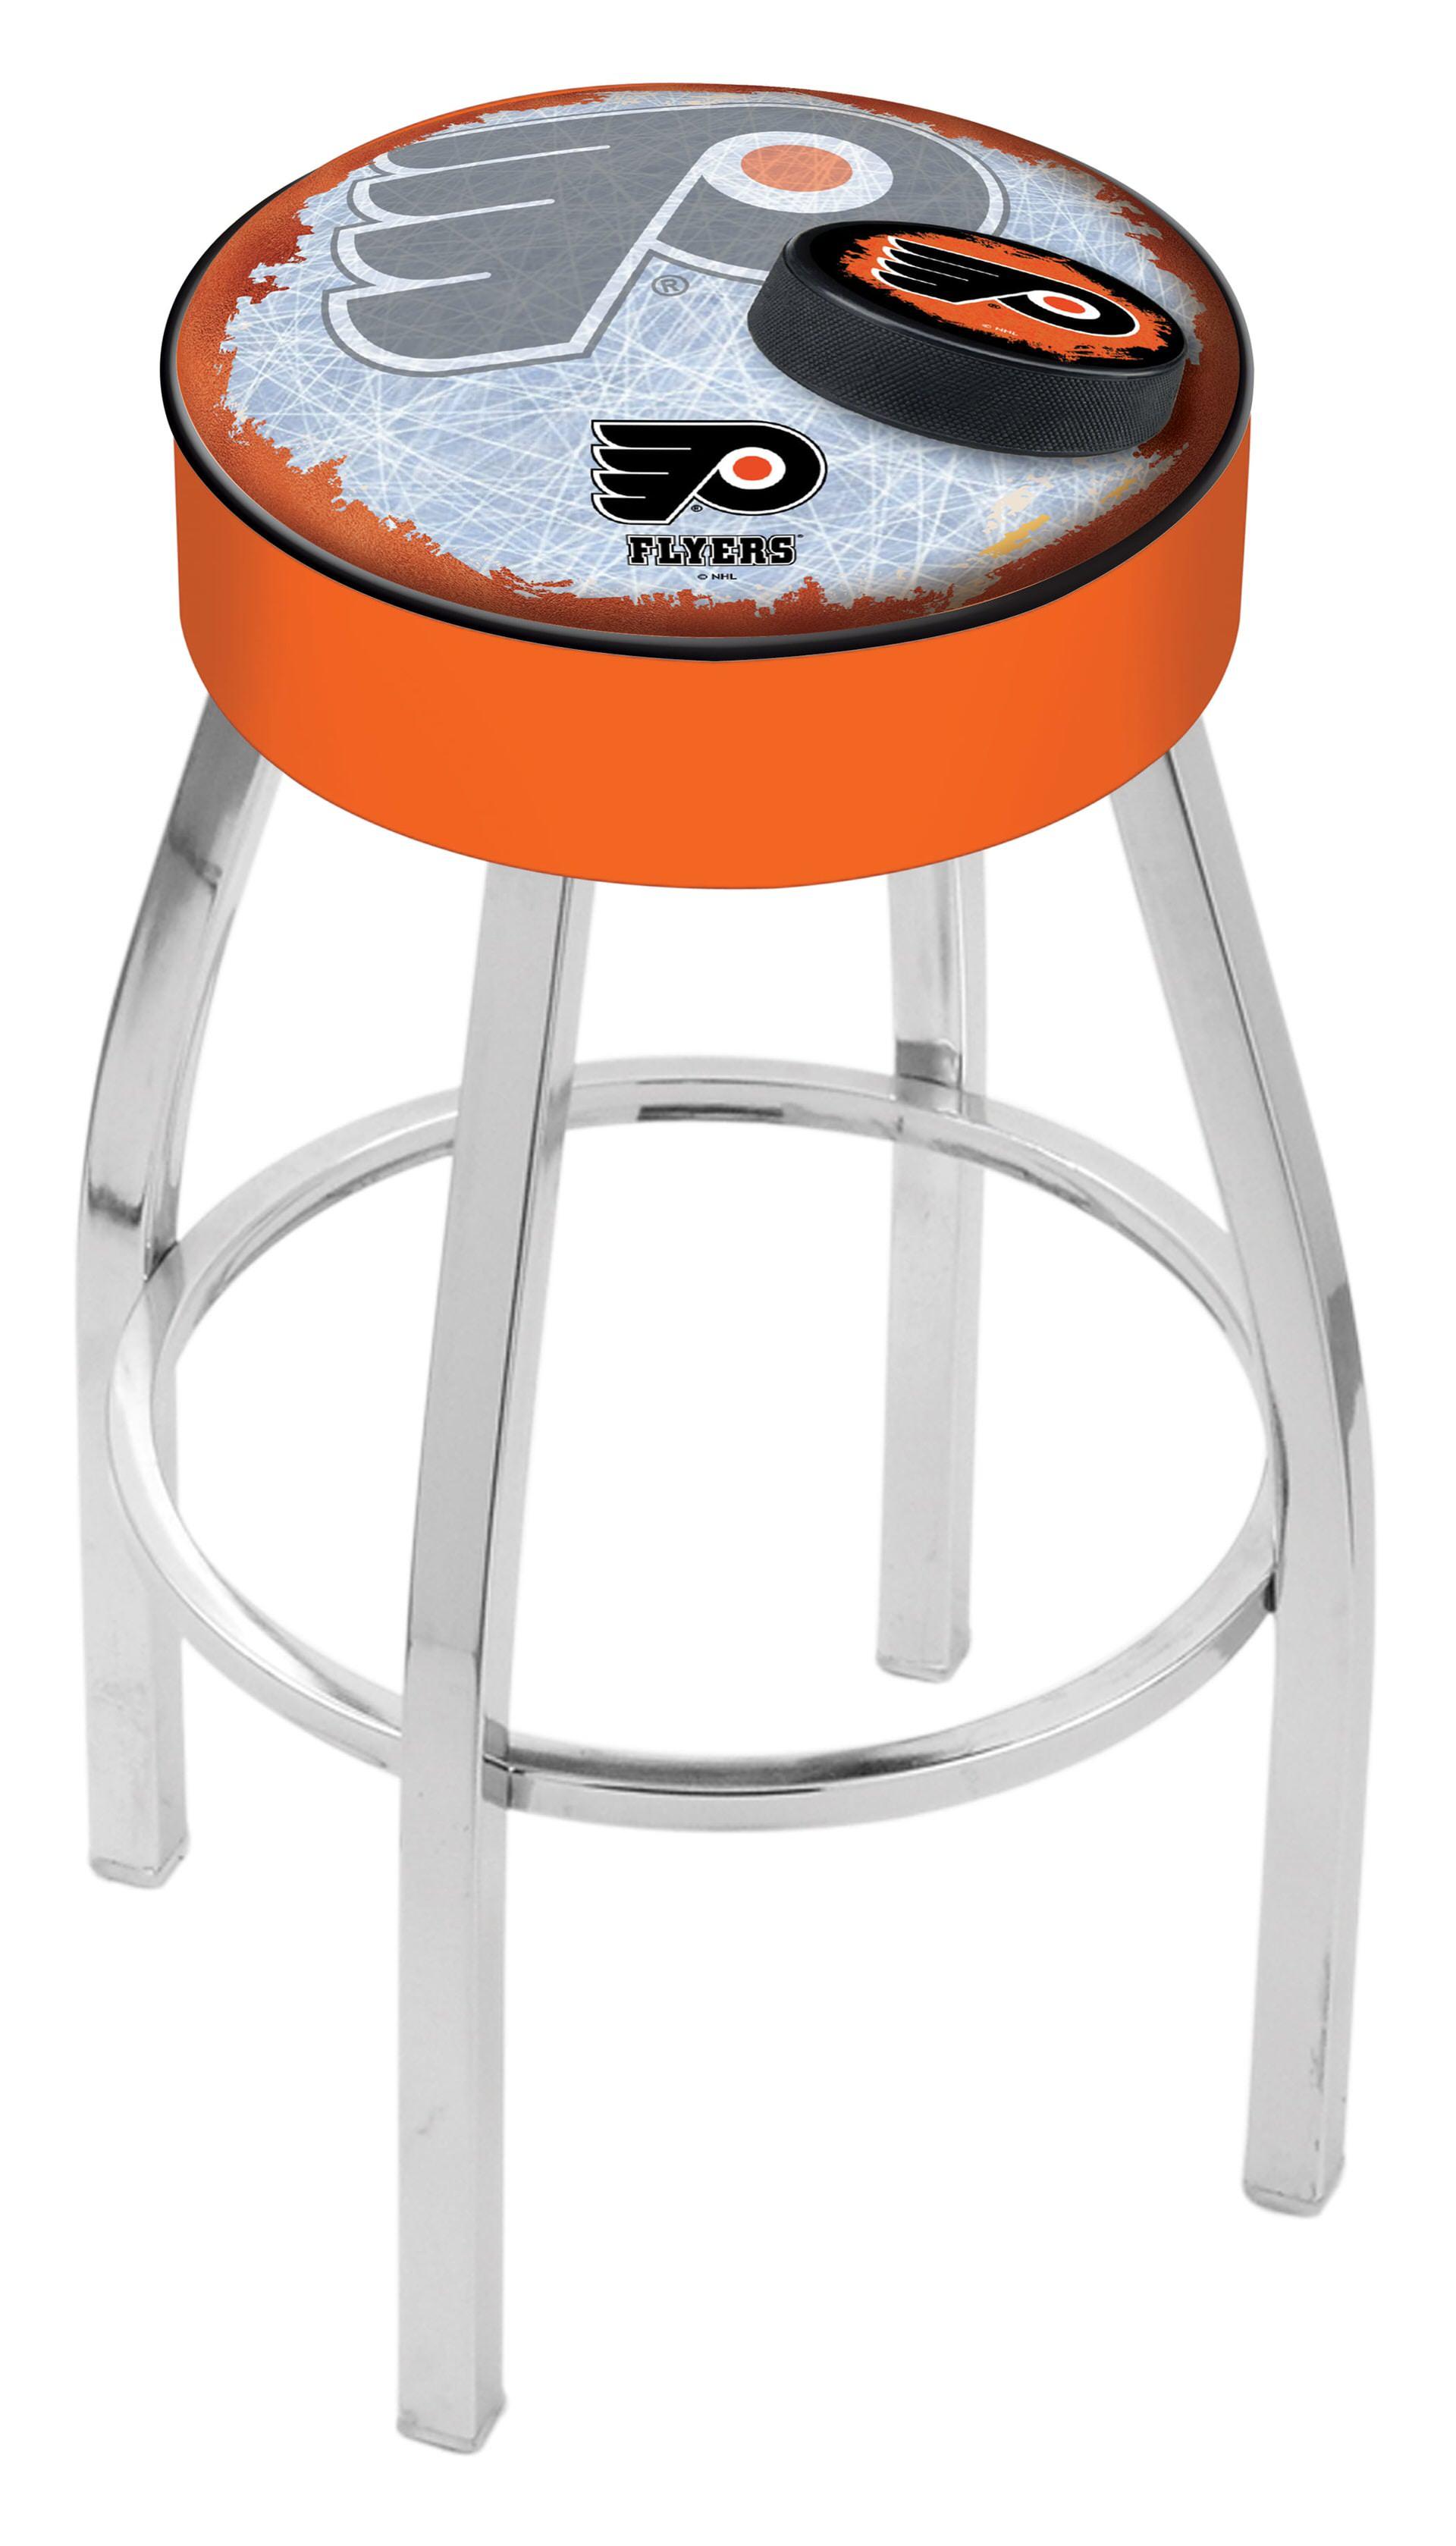 Philadelphia Flyers Counter Height Bar Stool Worange. Signature Homes Birmingham. Rustic Chandeliers With Crystals. Modern Grey Sofa. Wrought Iron Spindles. Staron Countertops. Grass Alternatives. Metal Deer Head. Wardrobe Furniture